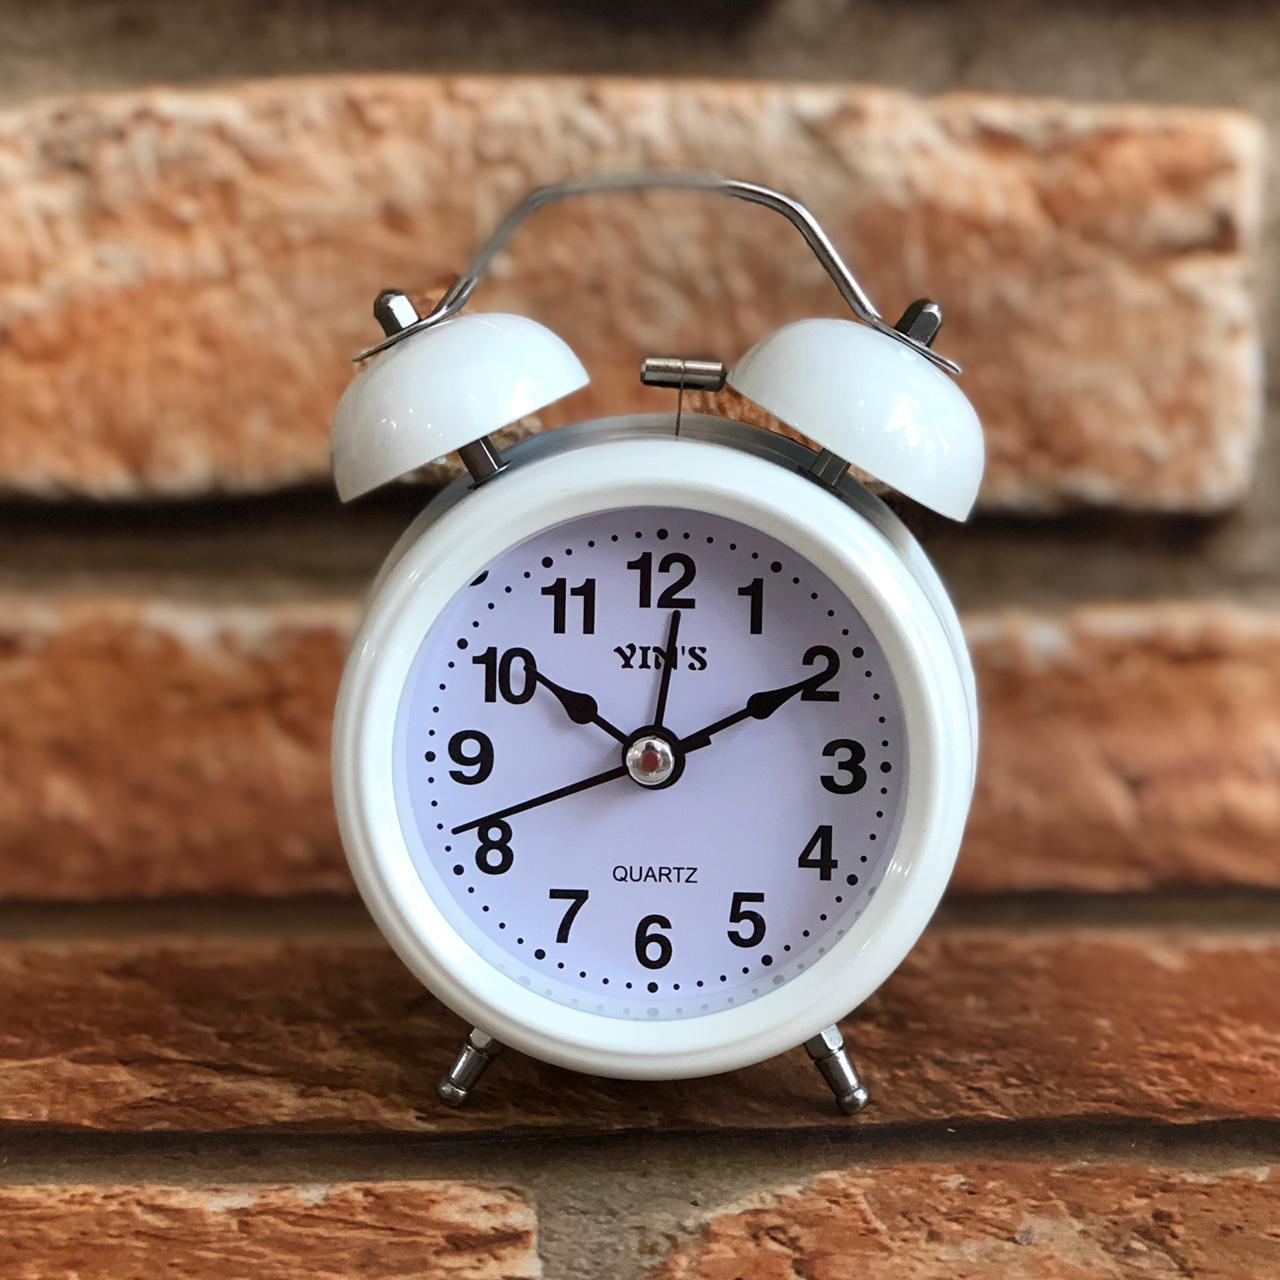 Relógio de Mesa Despertador Retrô Cores